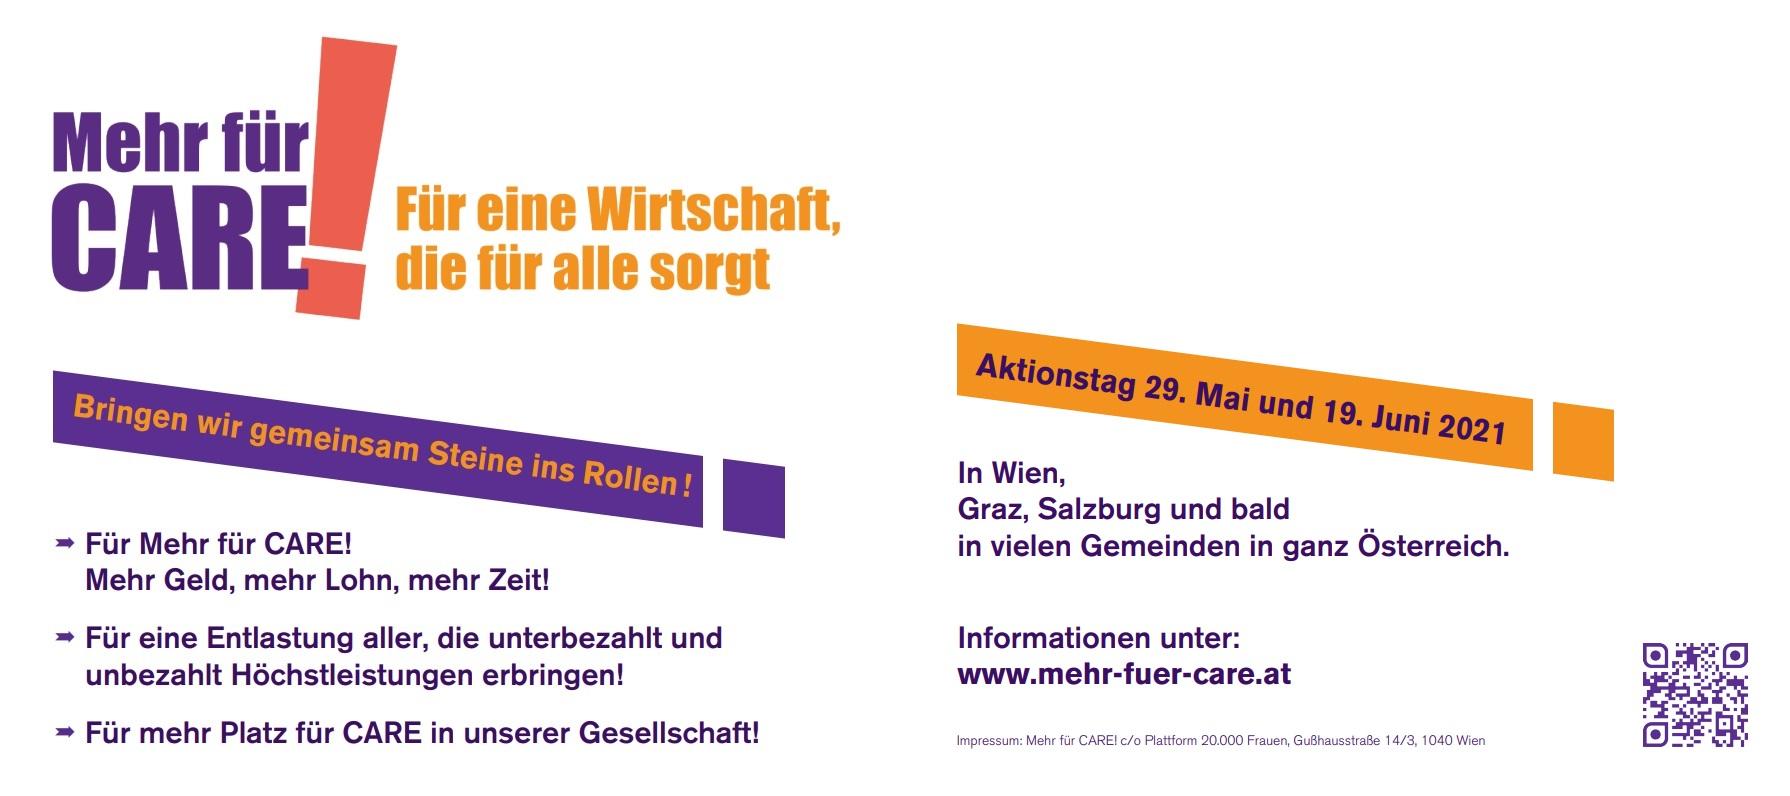 2021-05-21_Mehr-fuer-Care-Aktionstag_2021-05-29